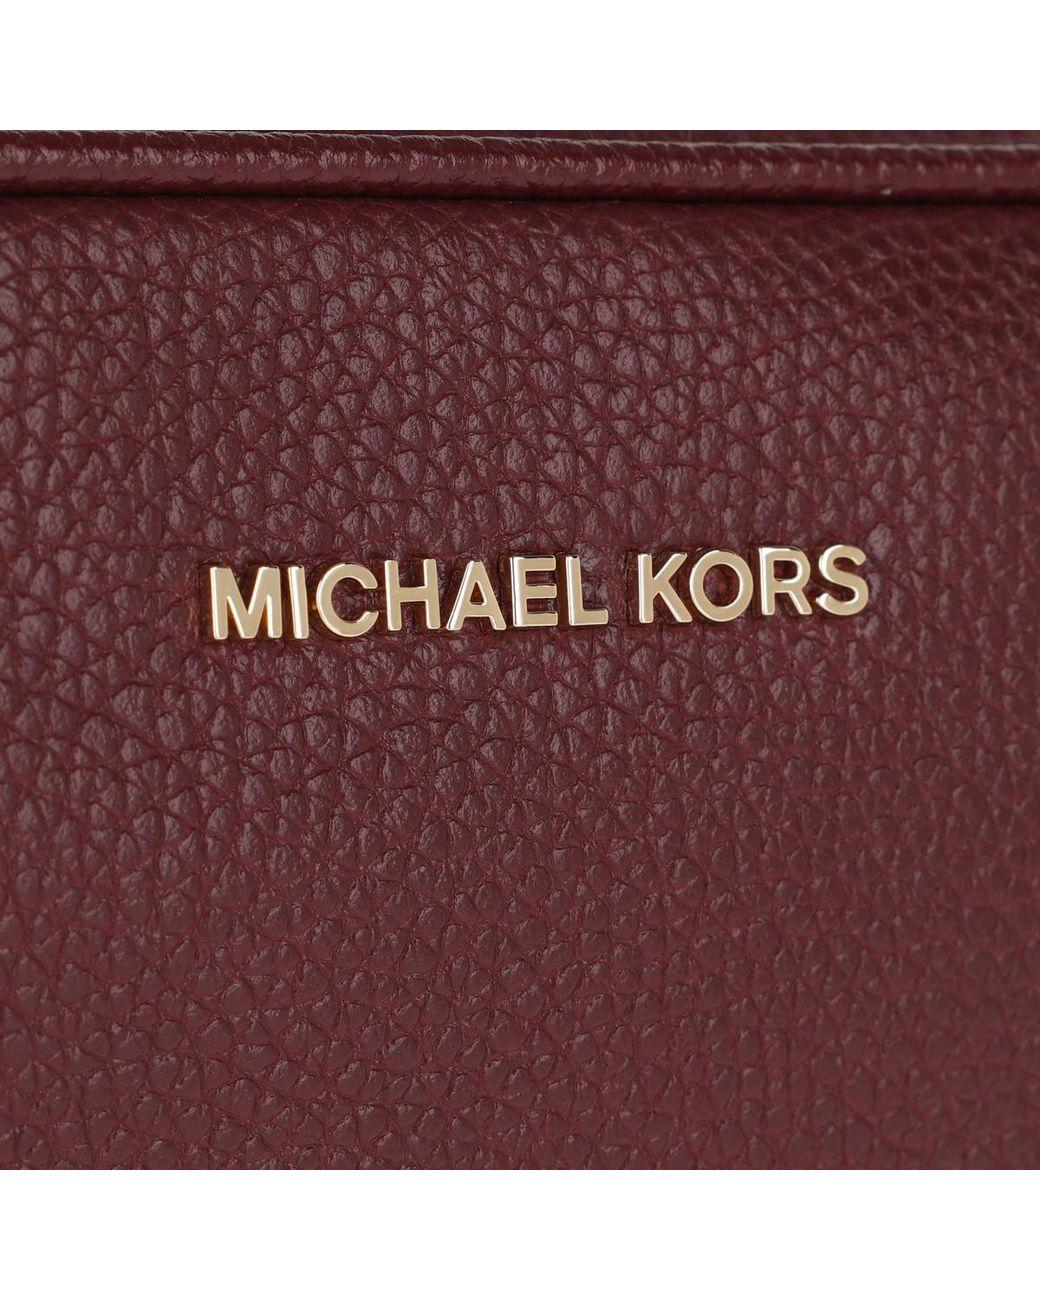 9a08b7f9fea9 Michael Kors Md Camera Bag Oxblood in Red - Lyst